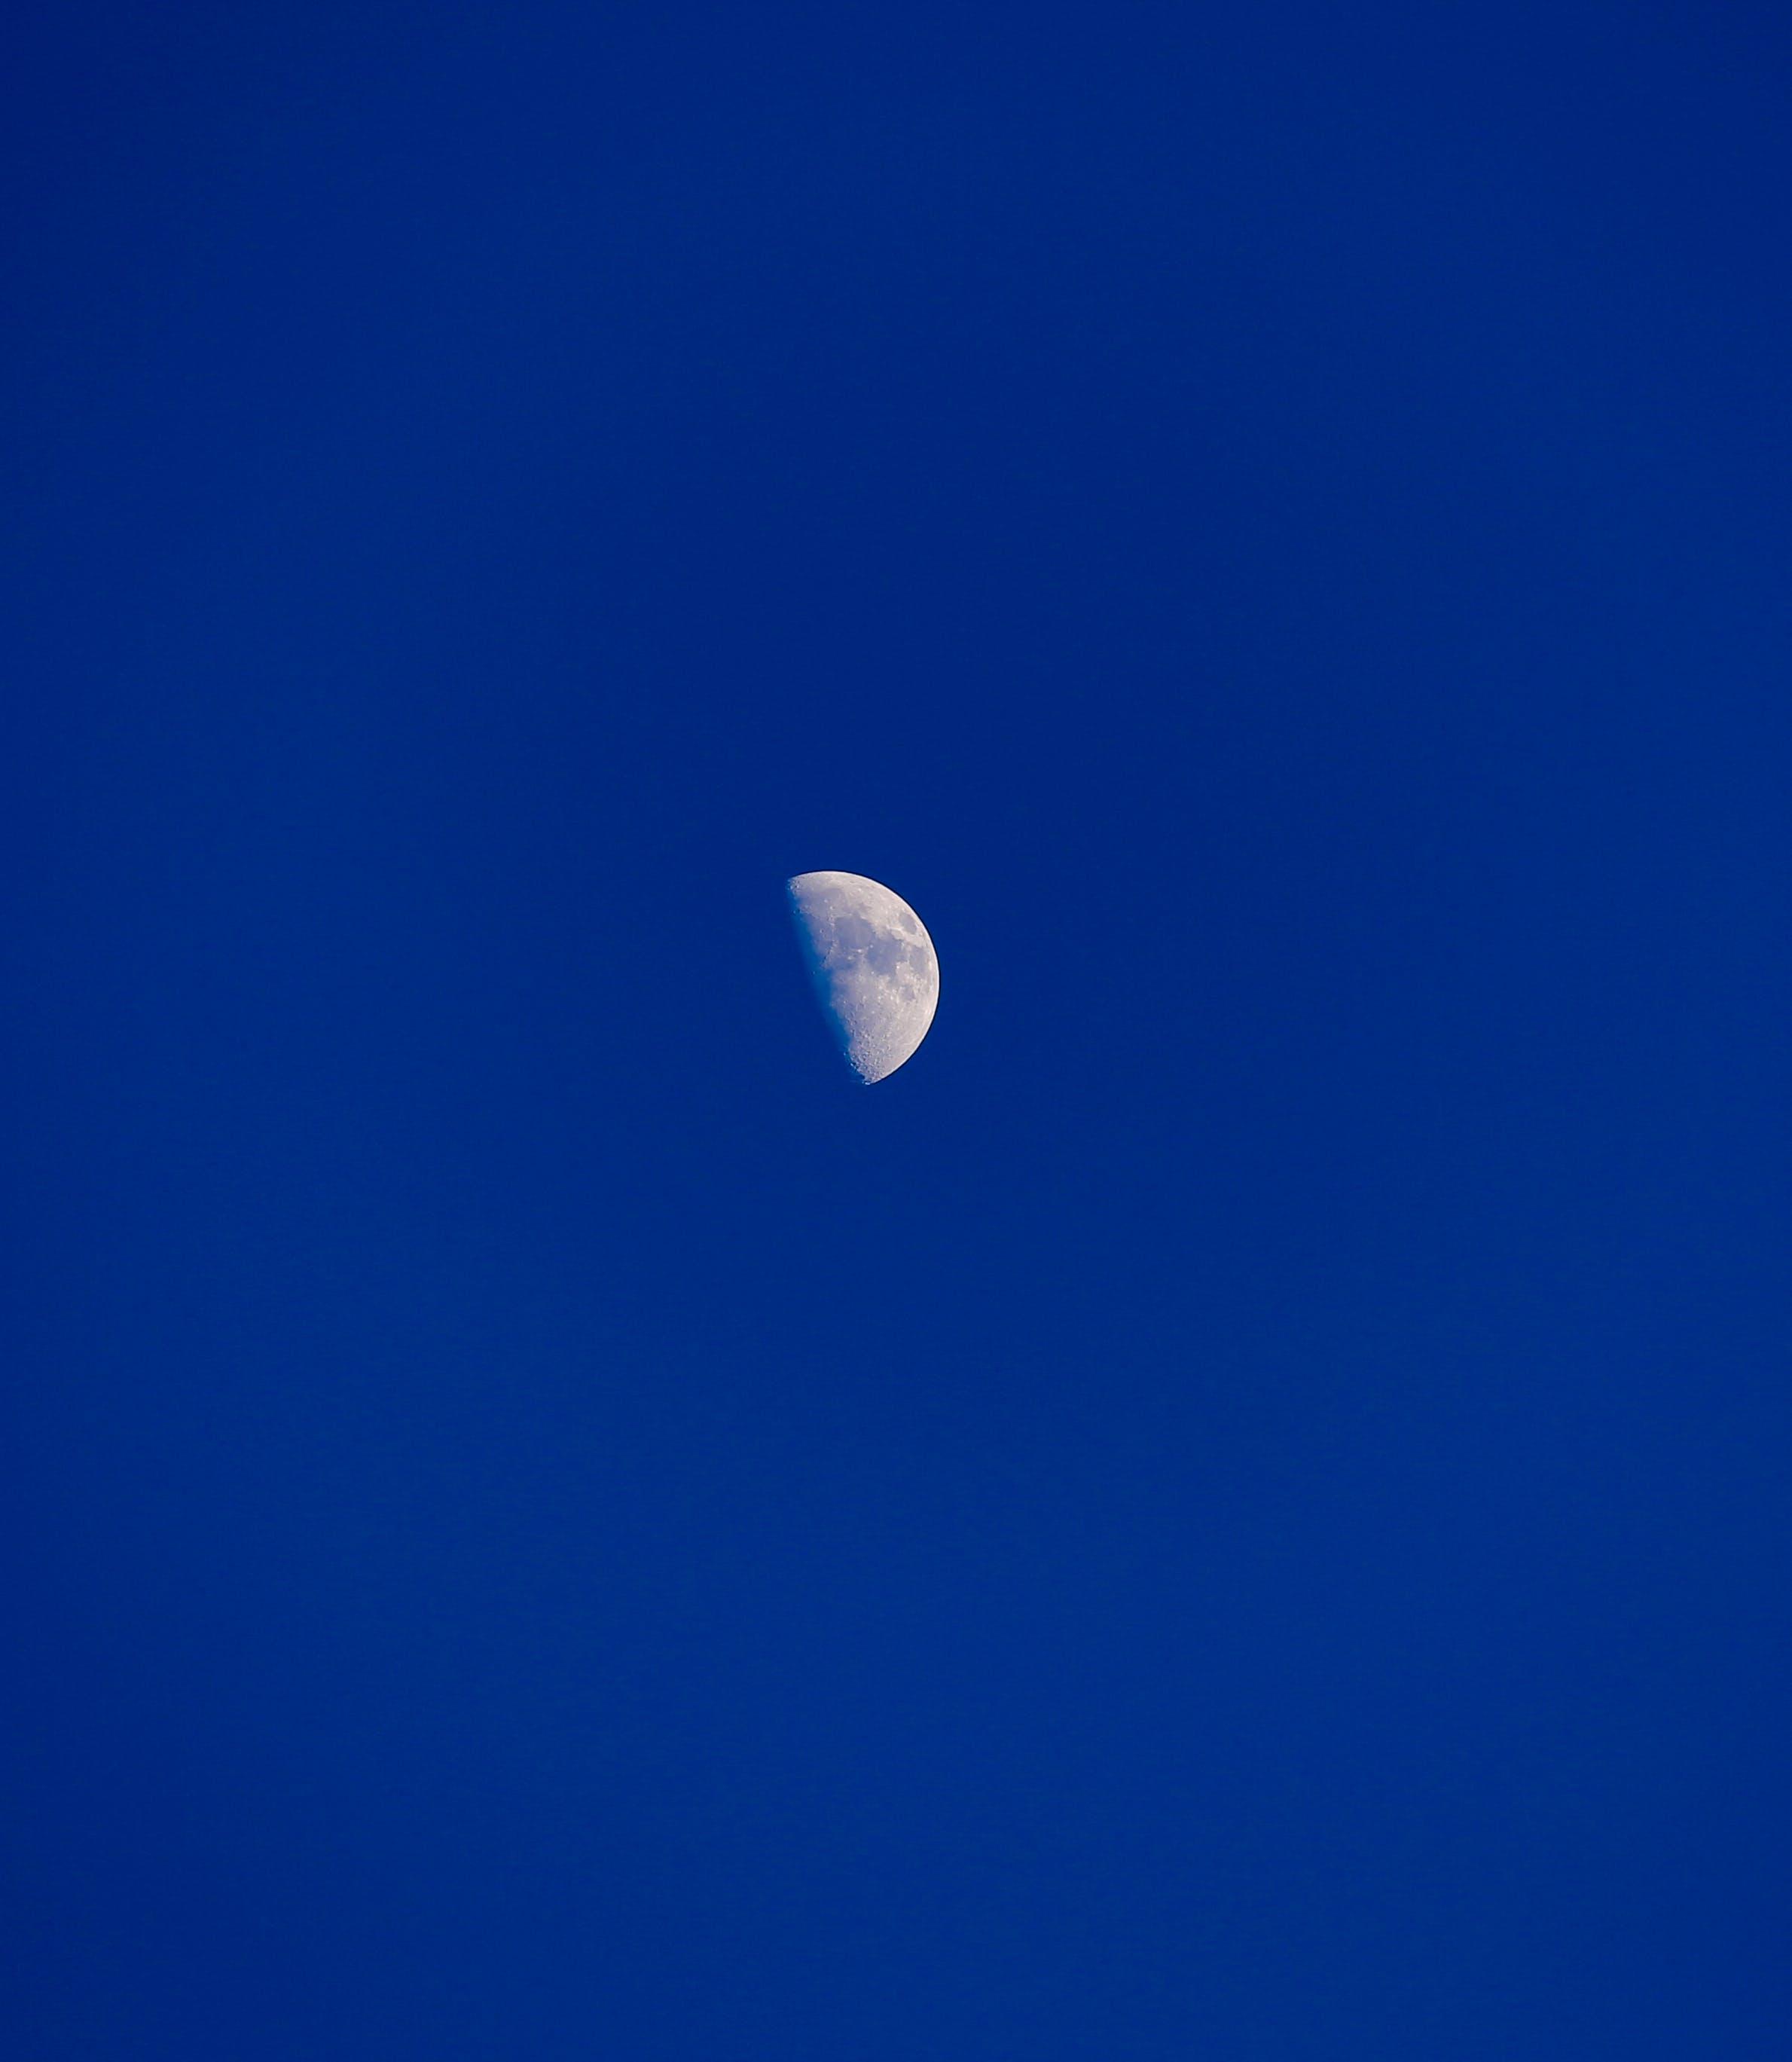 Free stock photo of half moon, half-moon